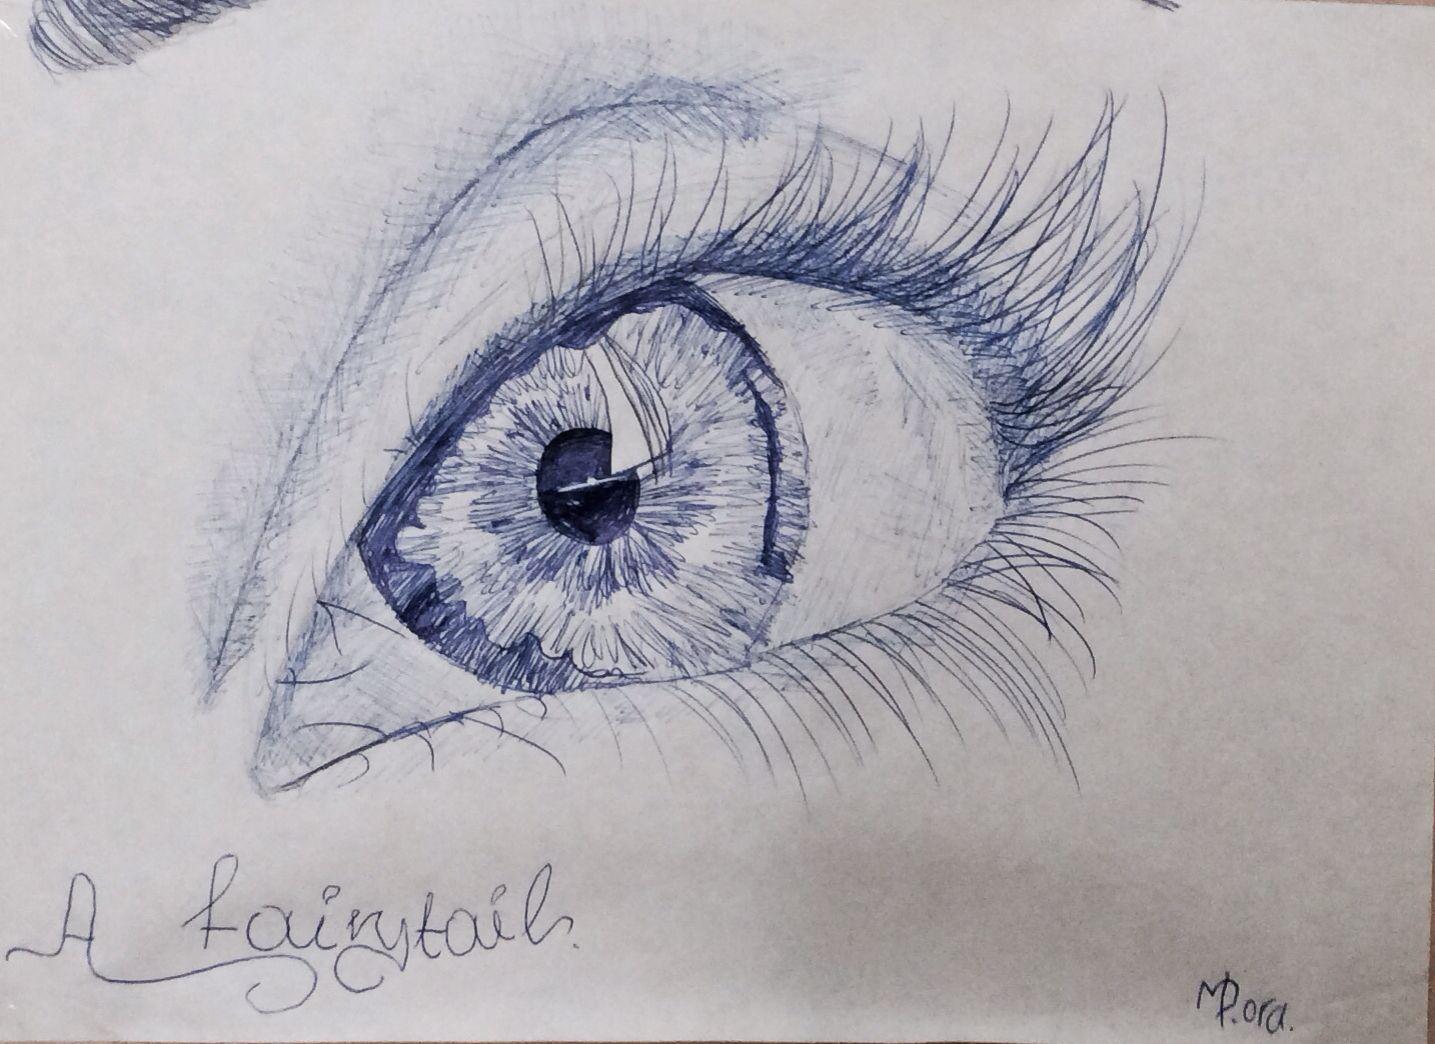 I spent 2 pens to make it !!!! Do you like it ???